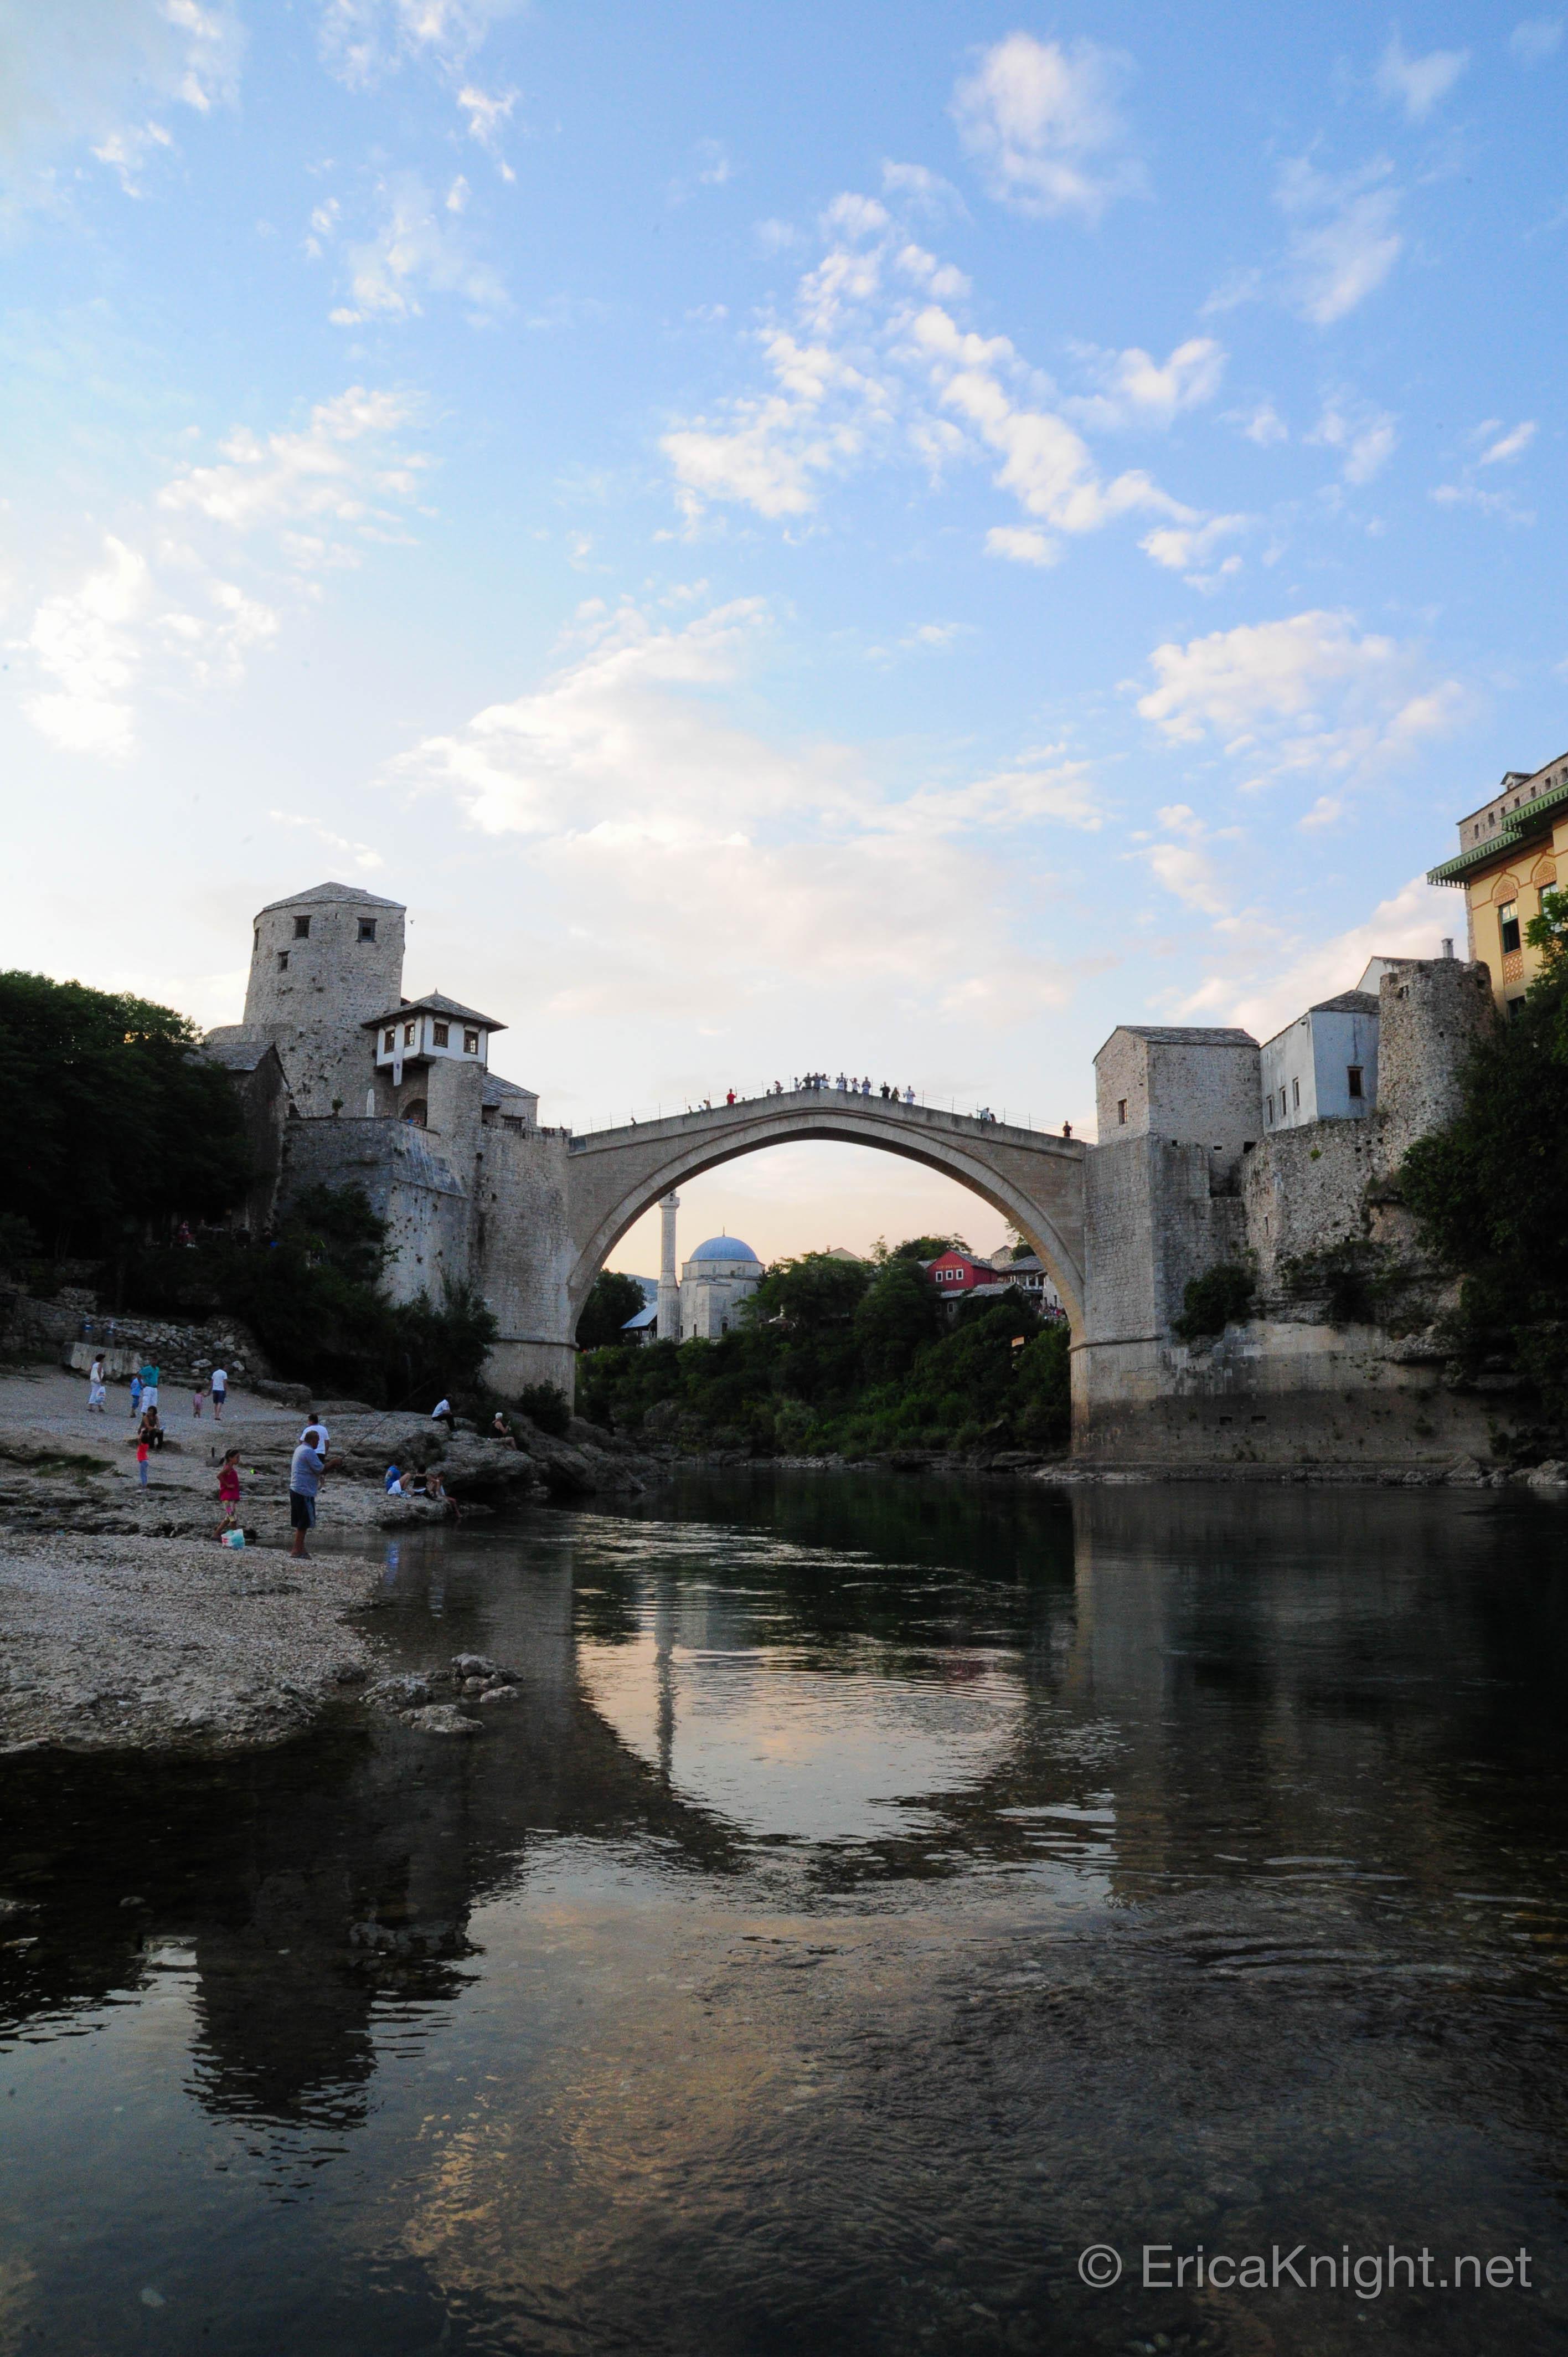 The Mostar Bridge - Mostar, Bosnia